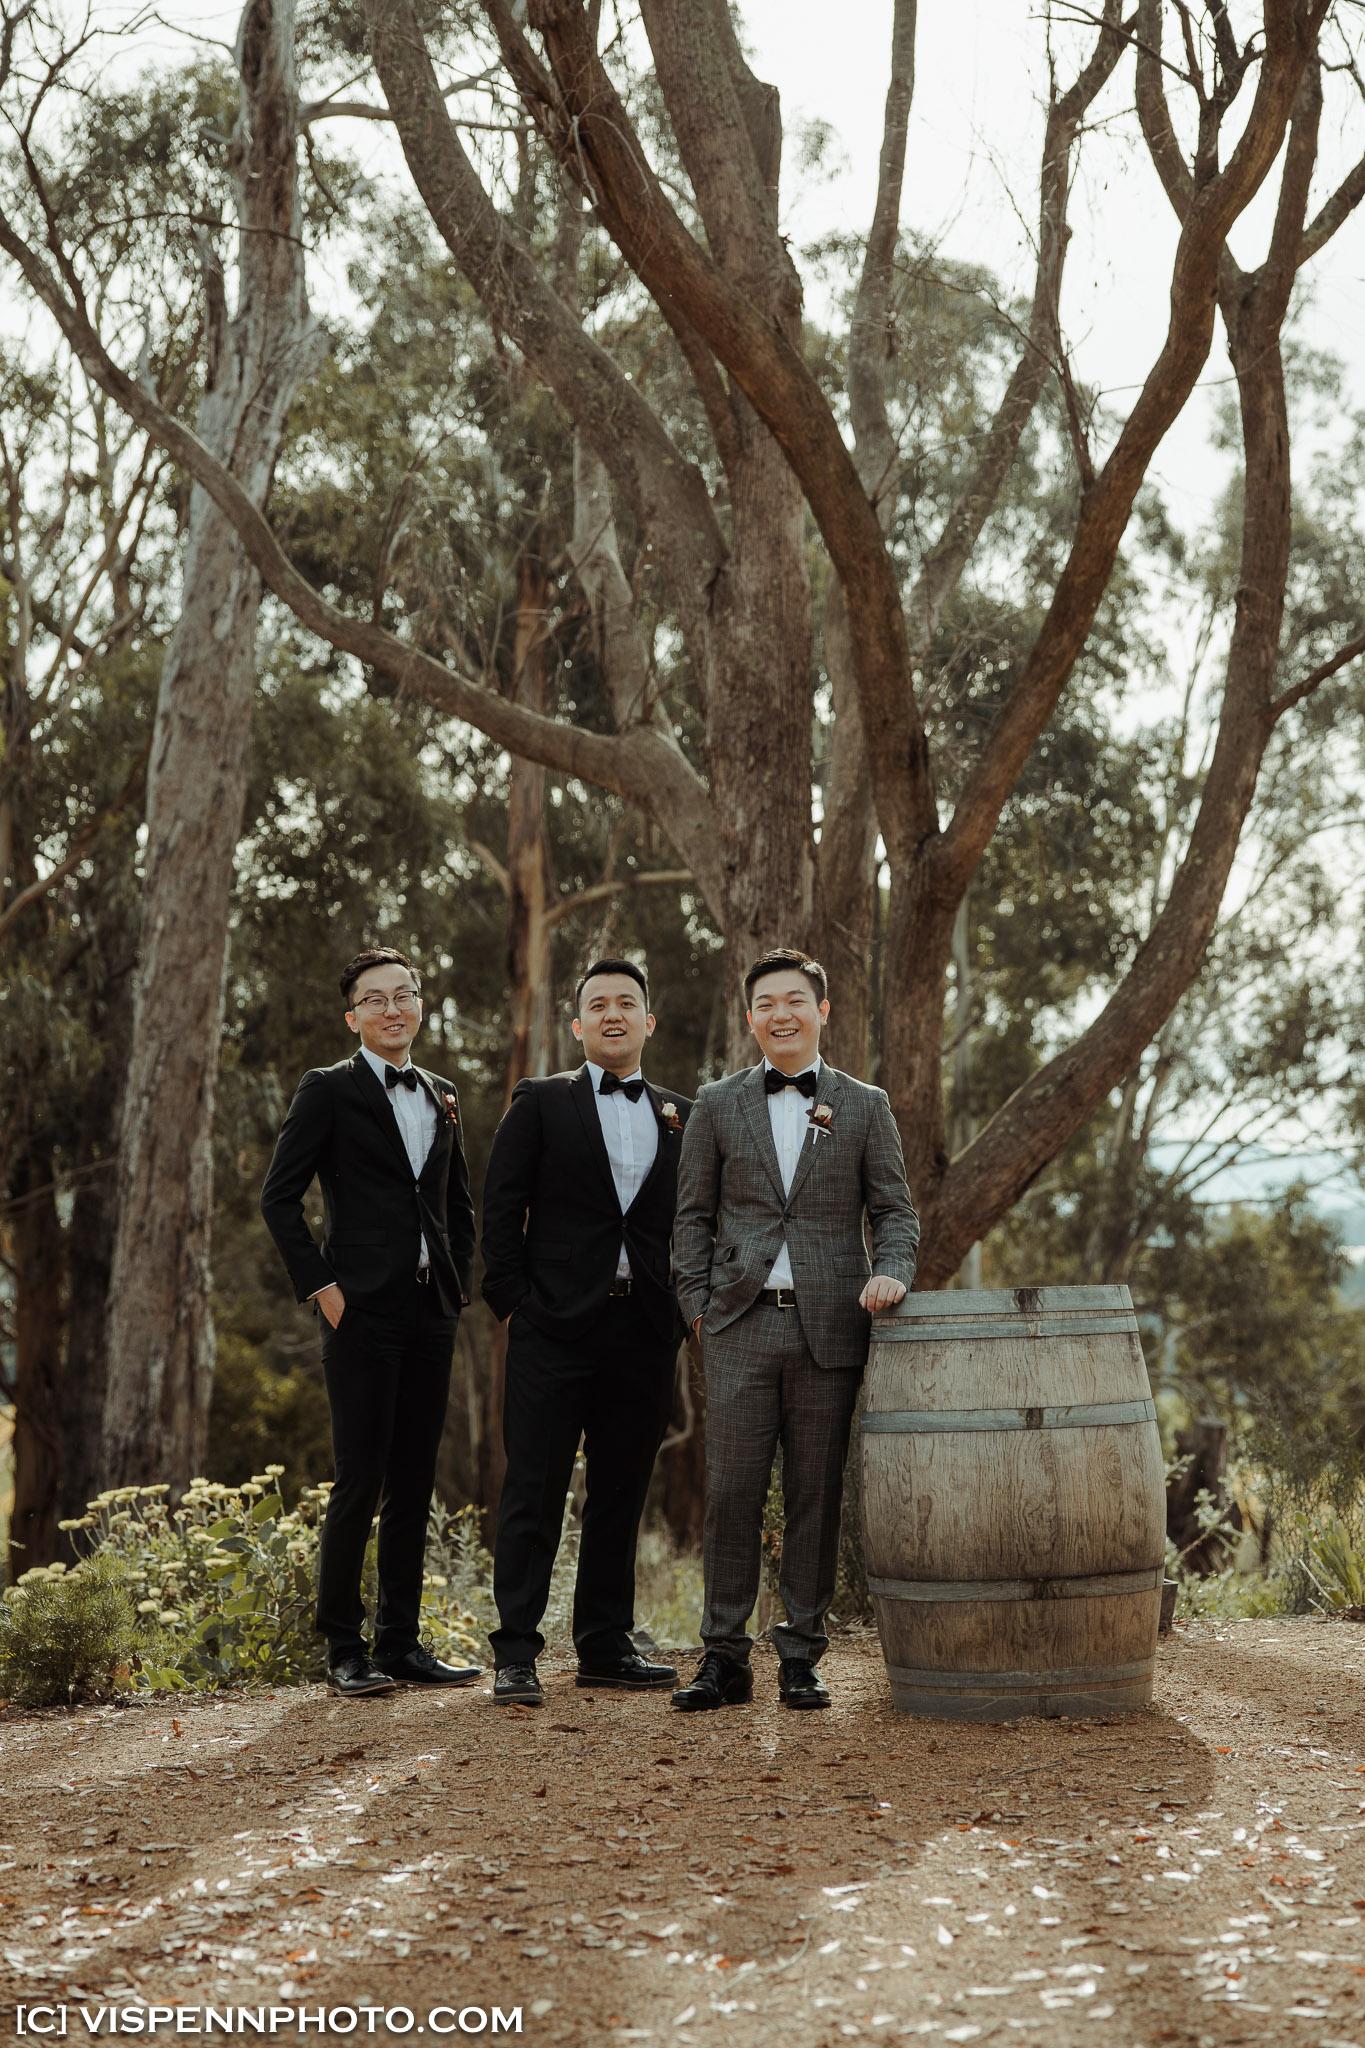 WEDDING DAY Photography Melbourne VISPENN 墨尔本 婚礼跟拍 婚礼摄像 婚礼摄影 结婚照 登记照 DominicHelen 1P 1937 EOSR VISPENN